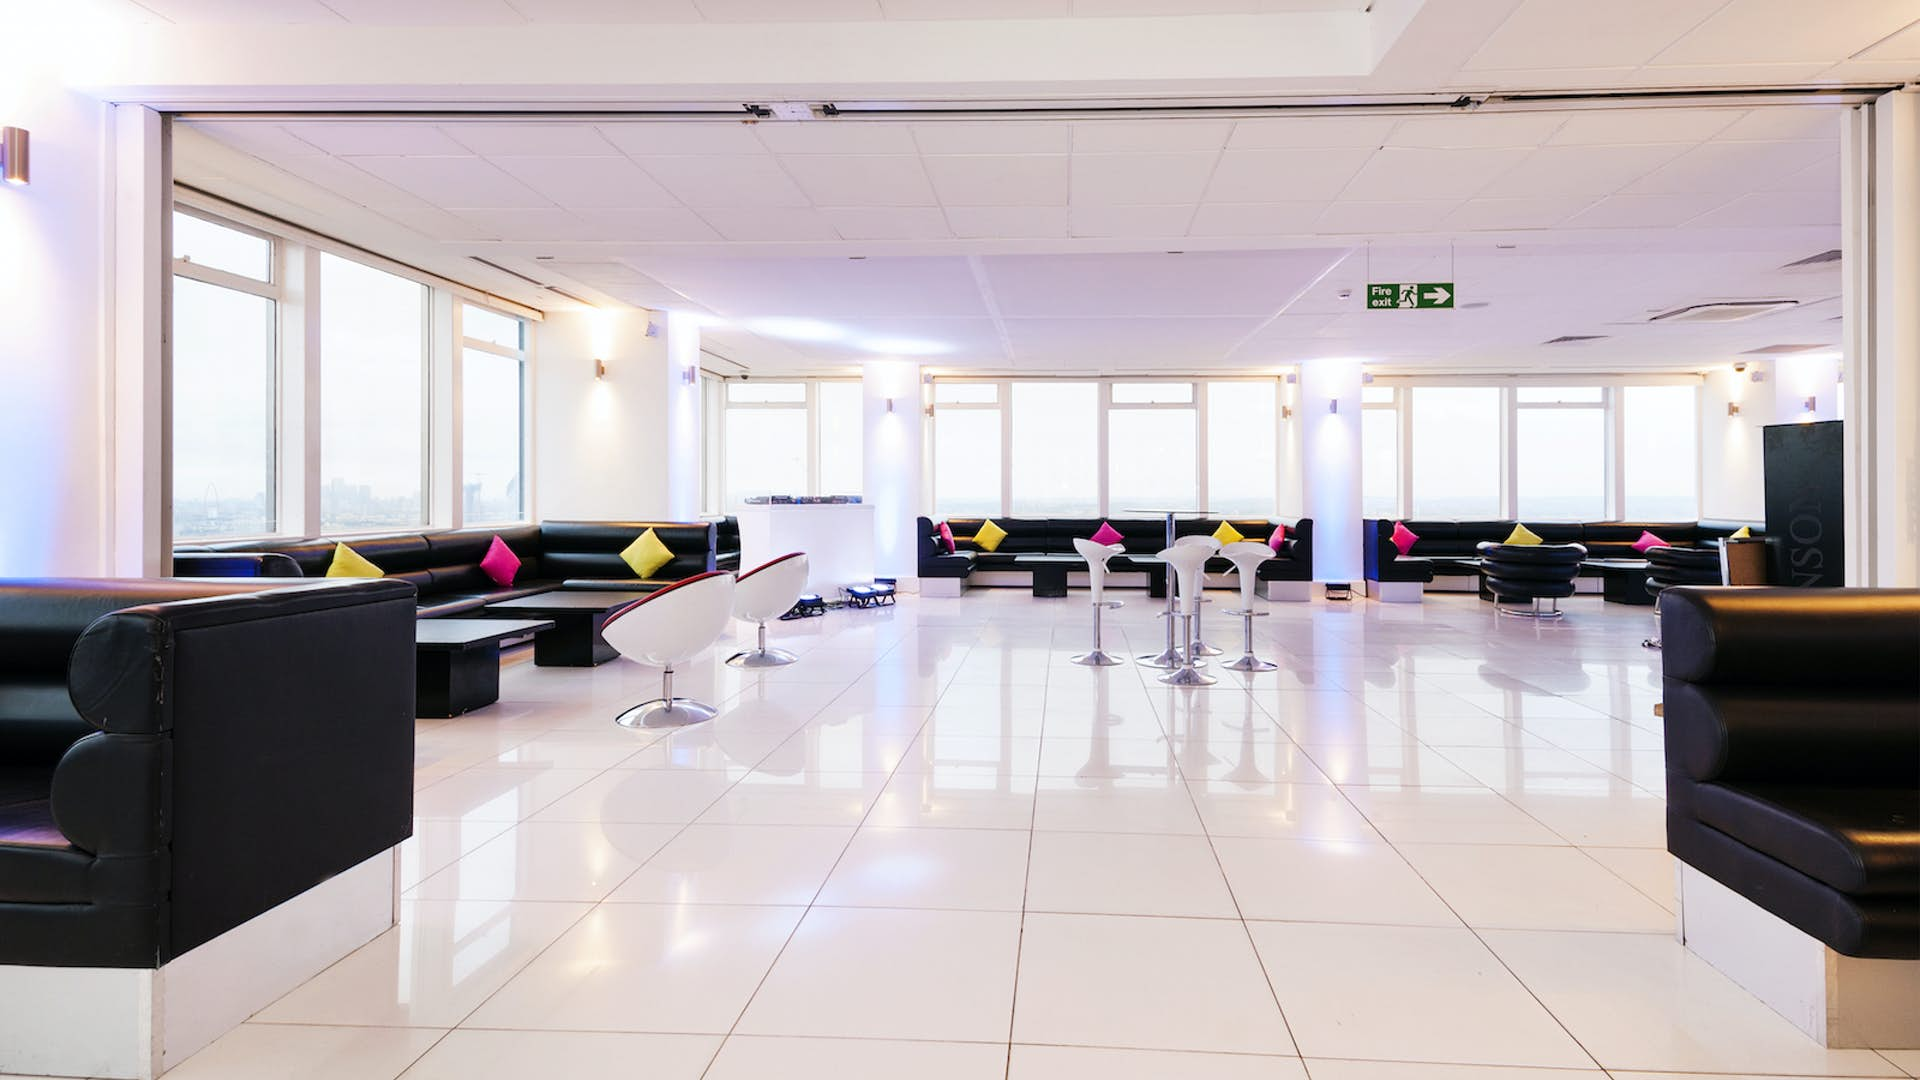 Whole Venue Business Hire Altitude 360